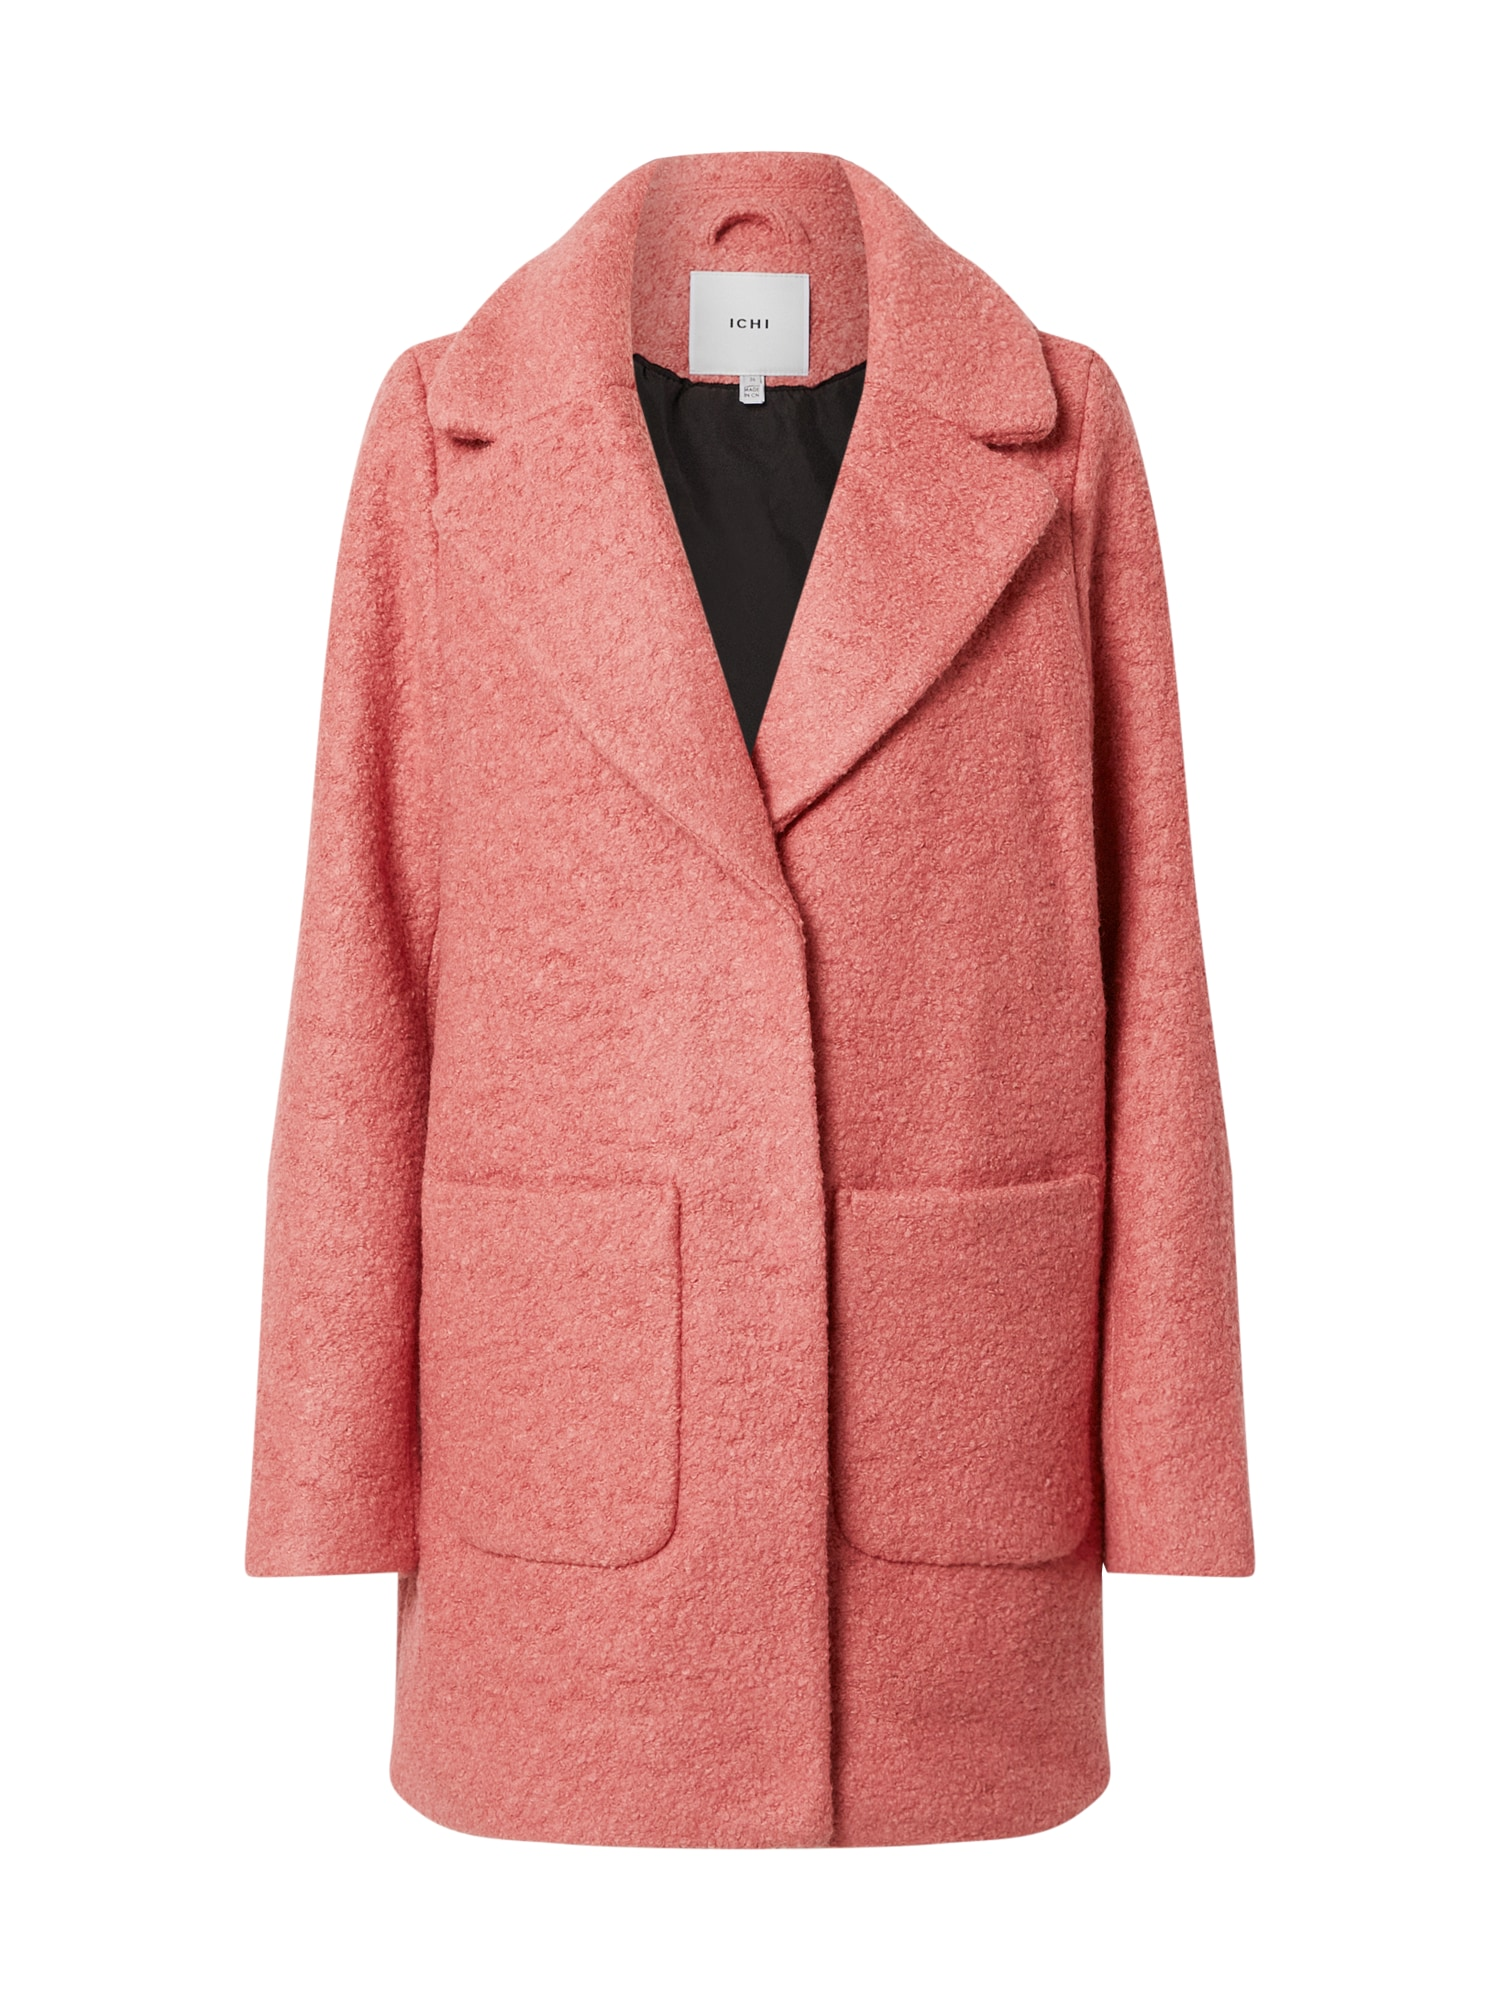 ICHI Demisezoninis paltas rožinė